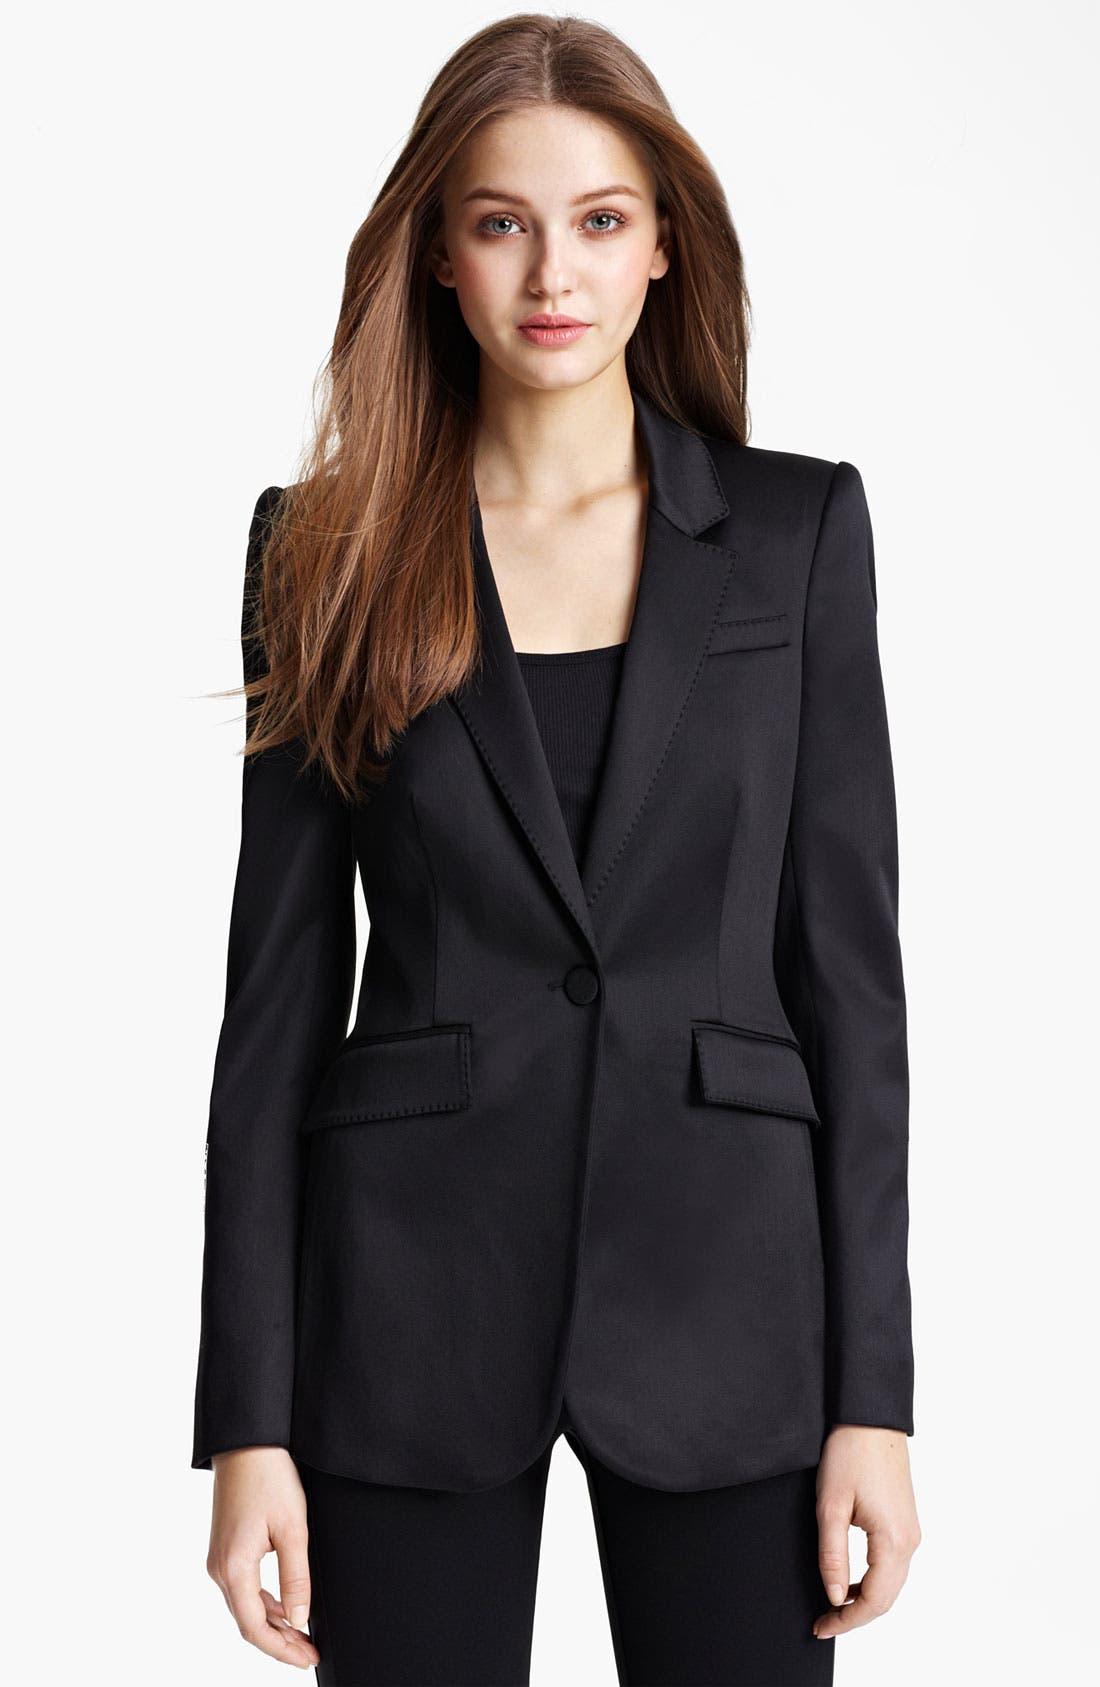 Main Image - Burberry London Satin Tuxedo Jacket